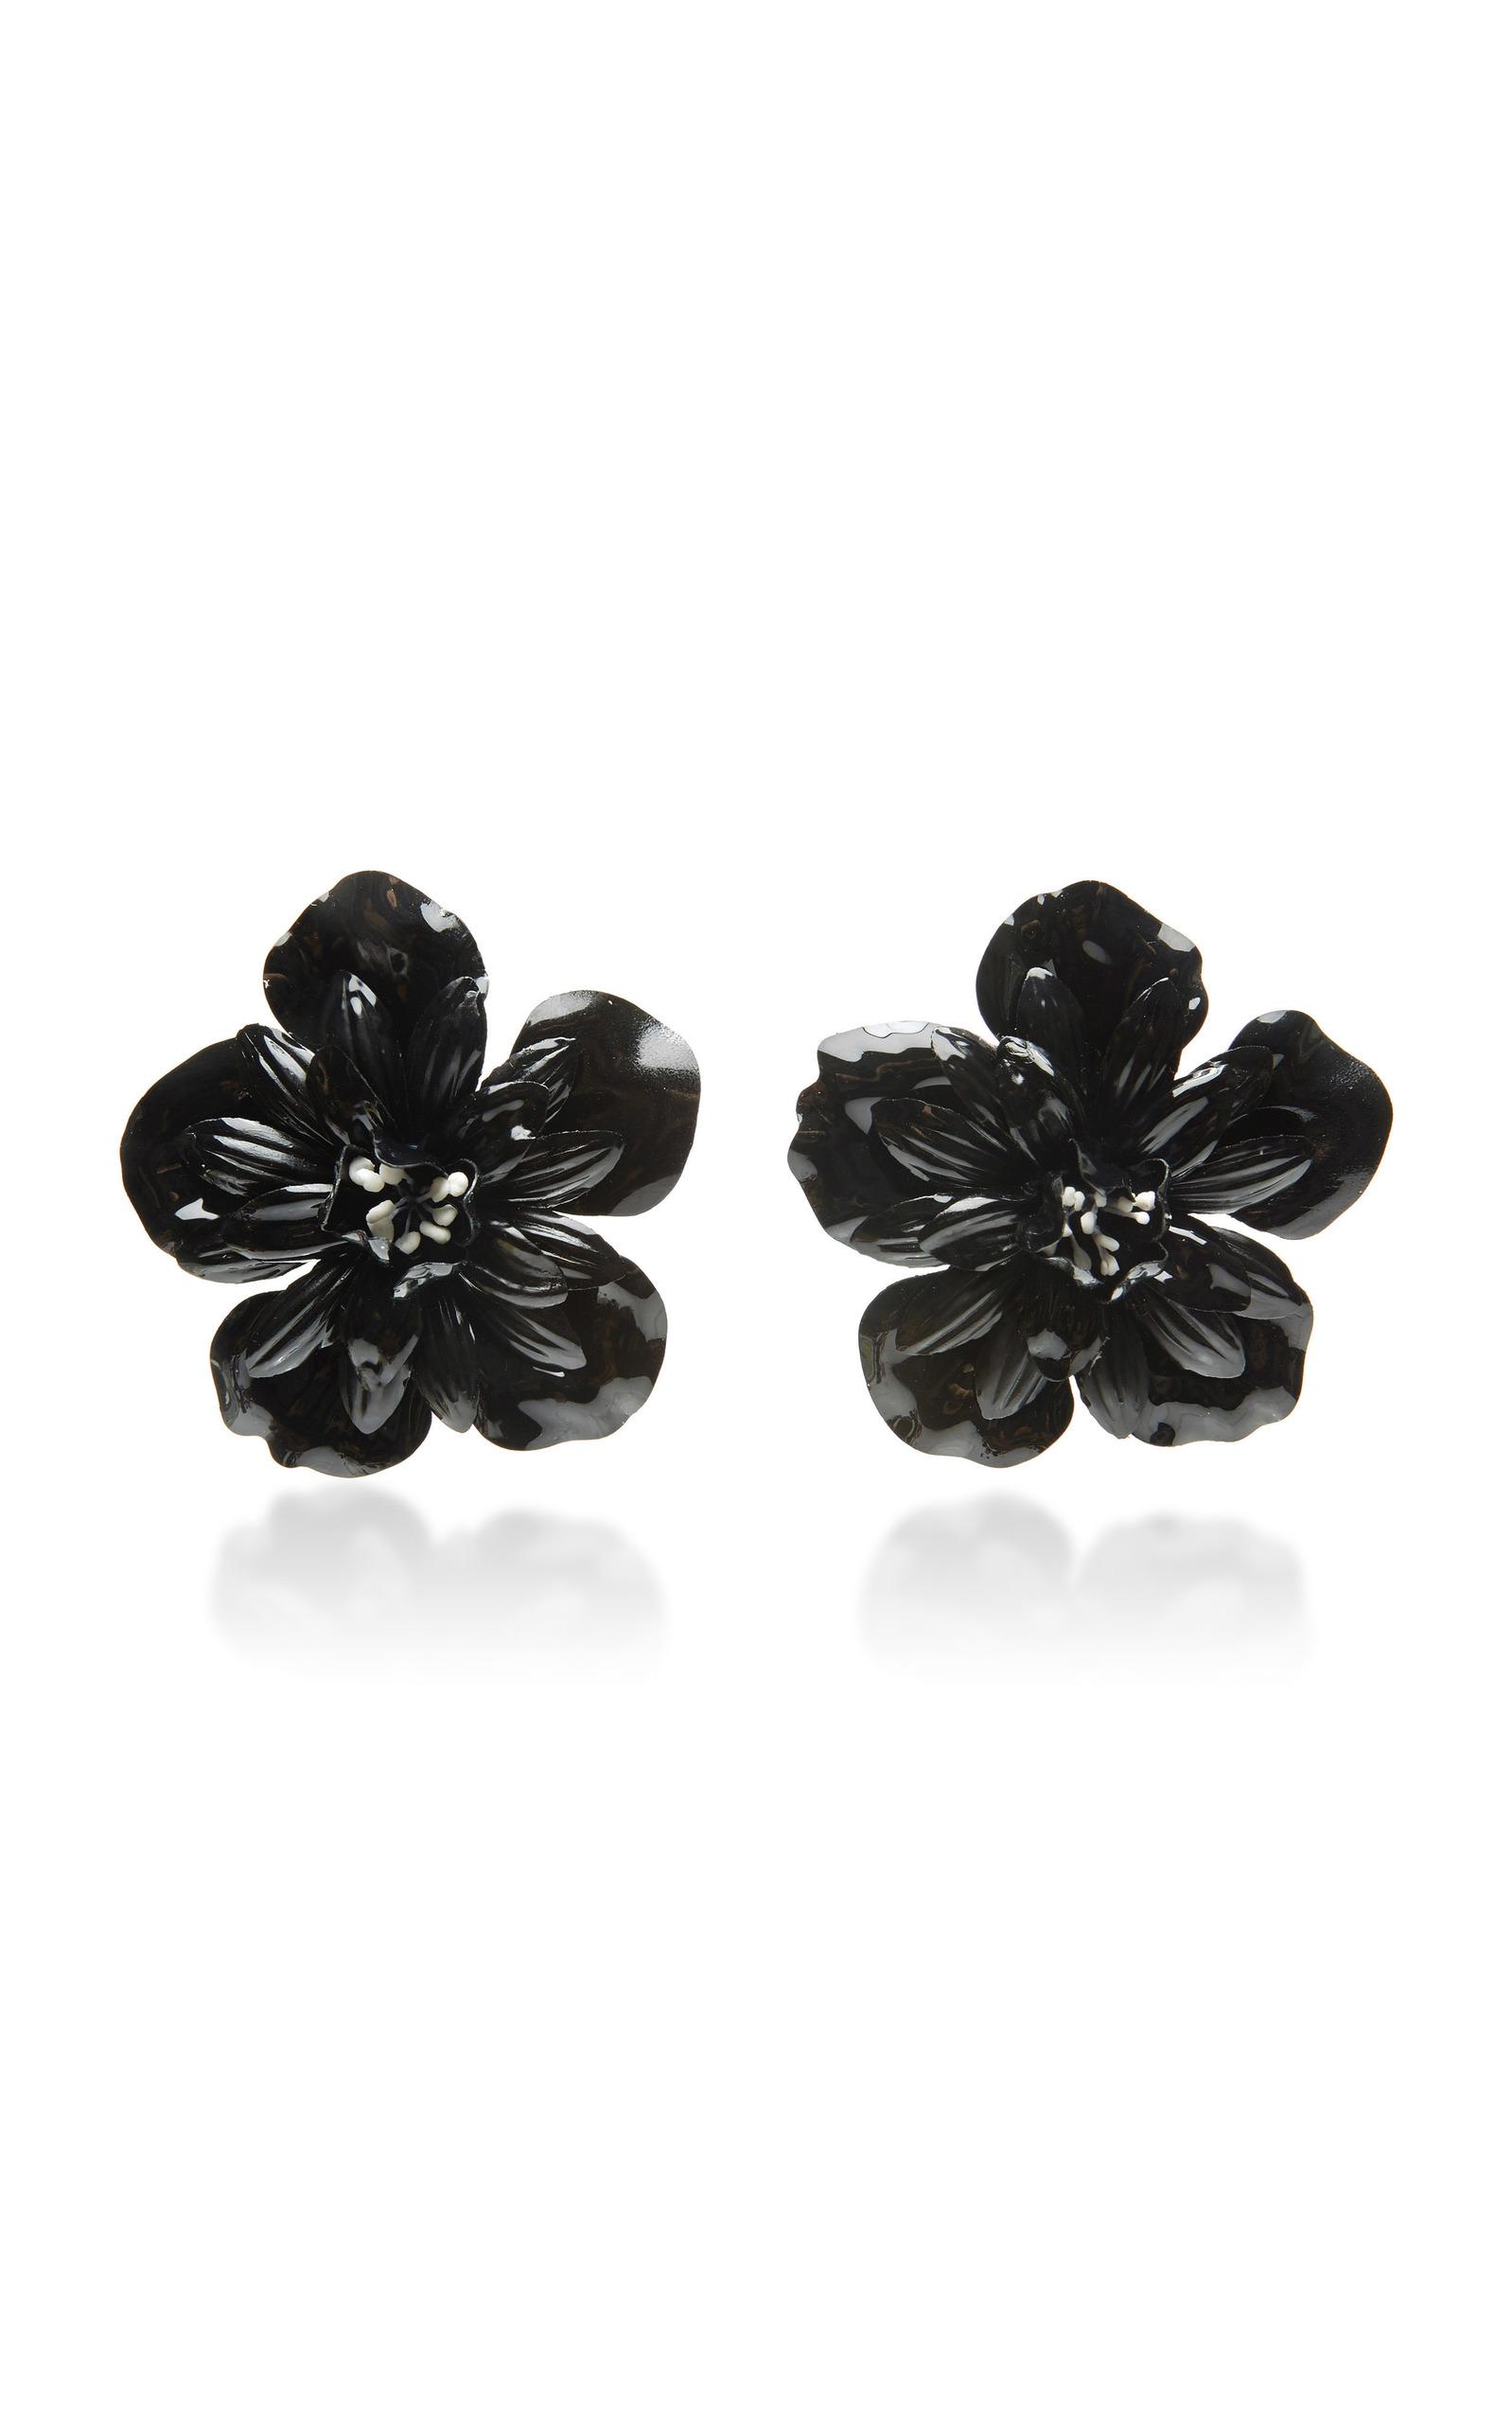 Isabel Marant Aloha earrings sx0X9y96